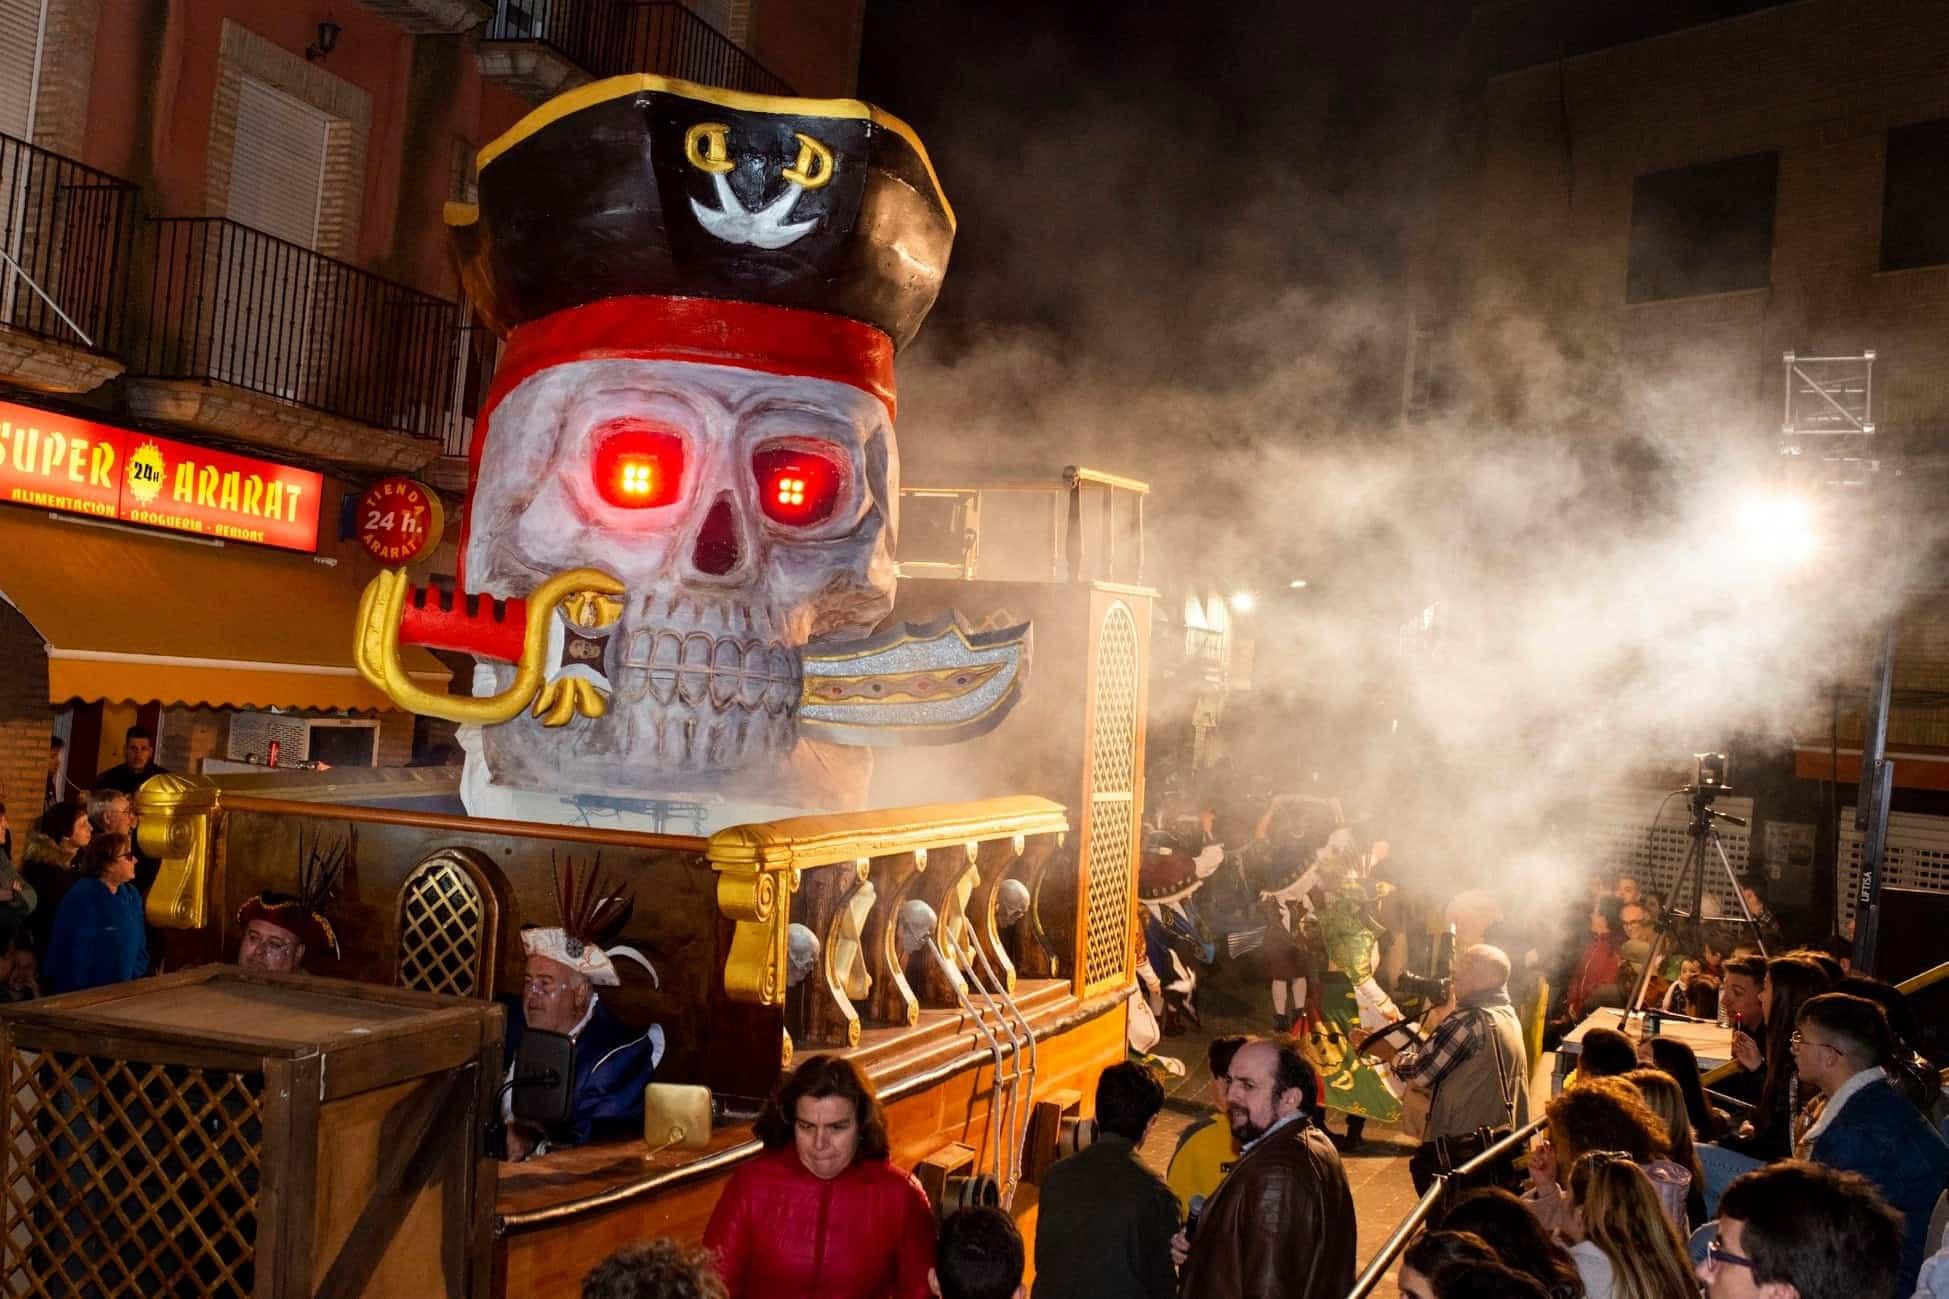 Carnaval de herencia 2020 ofertorio 20 - Selección de fotografías del Ofertorio del Carnaval de Herencia